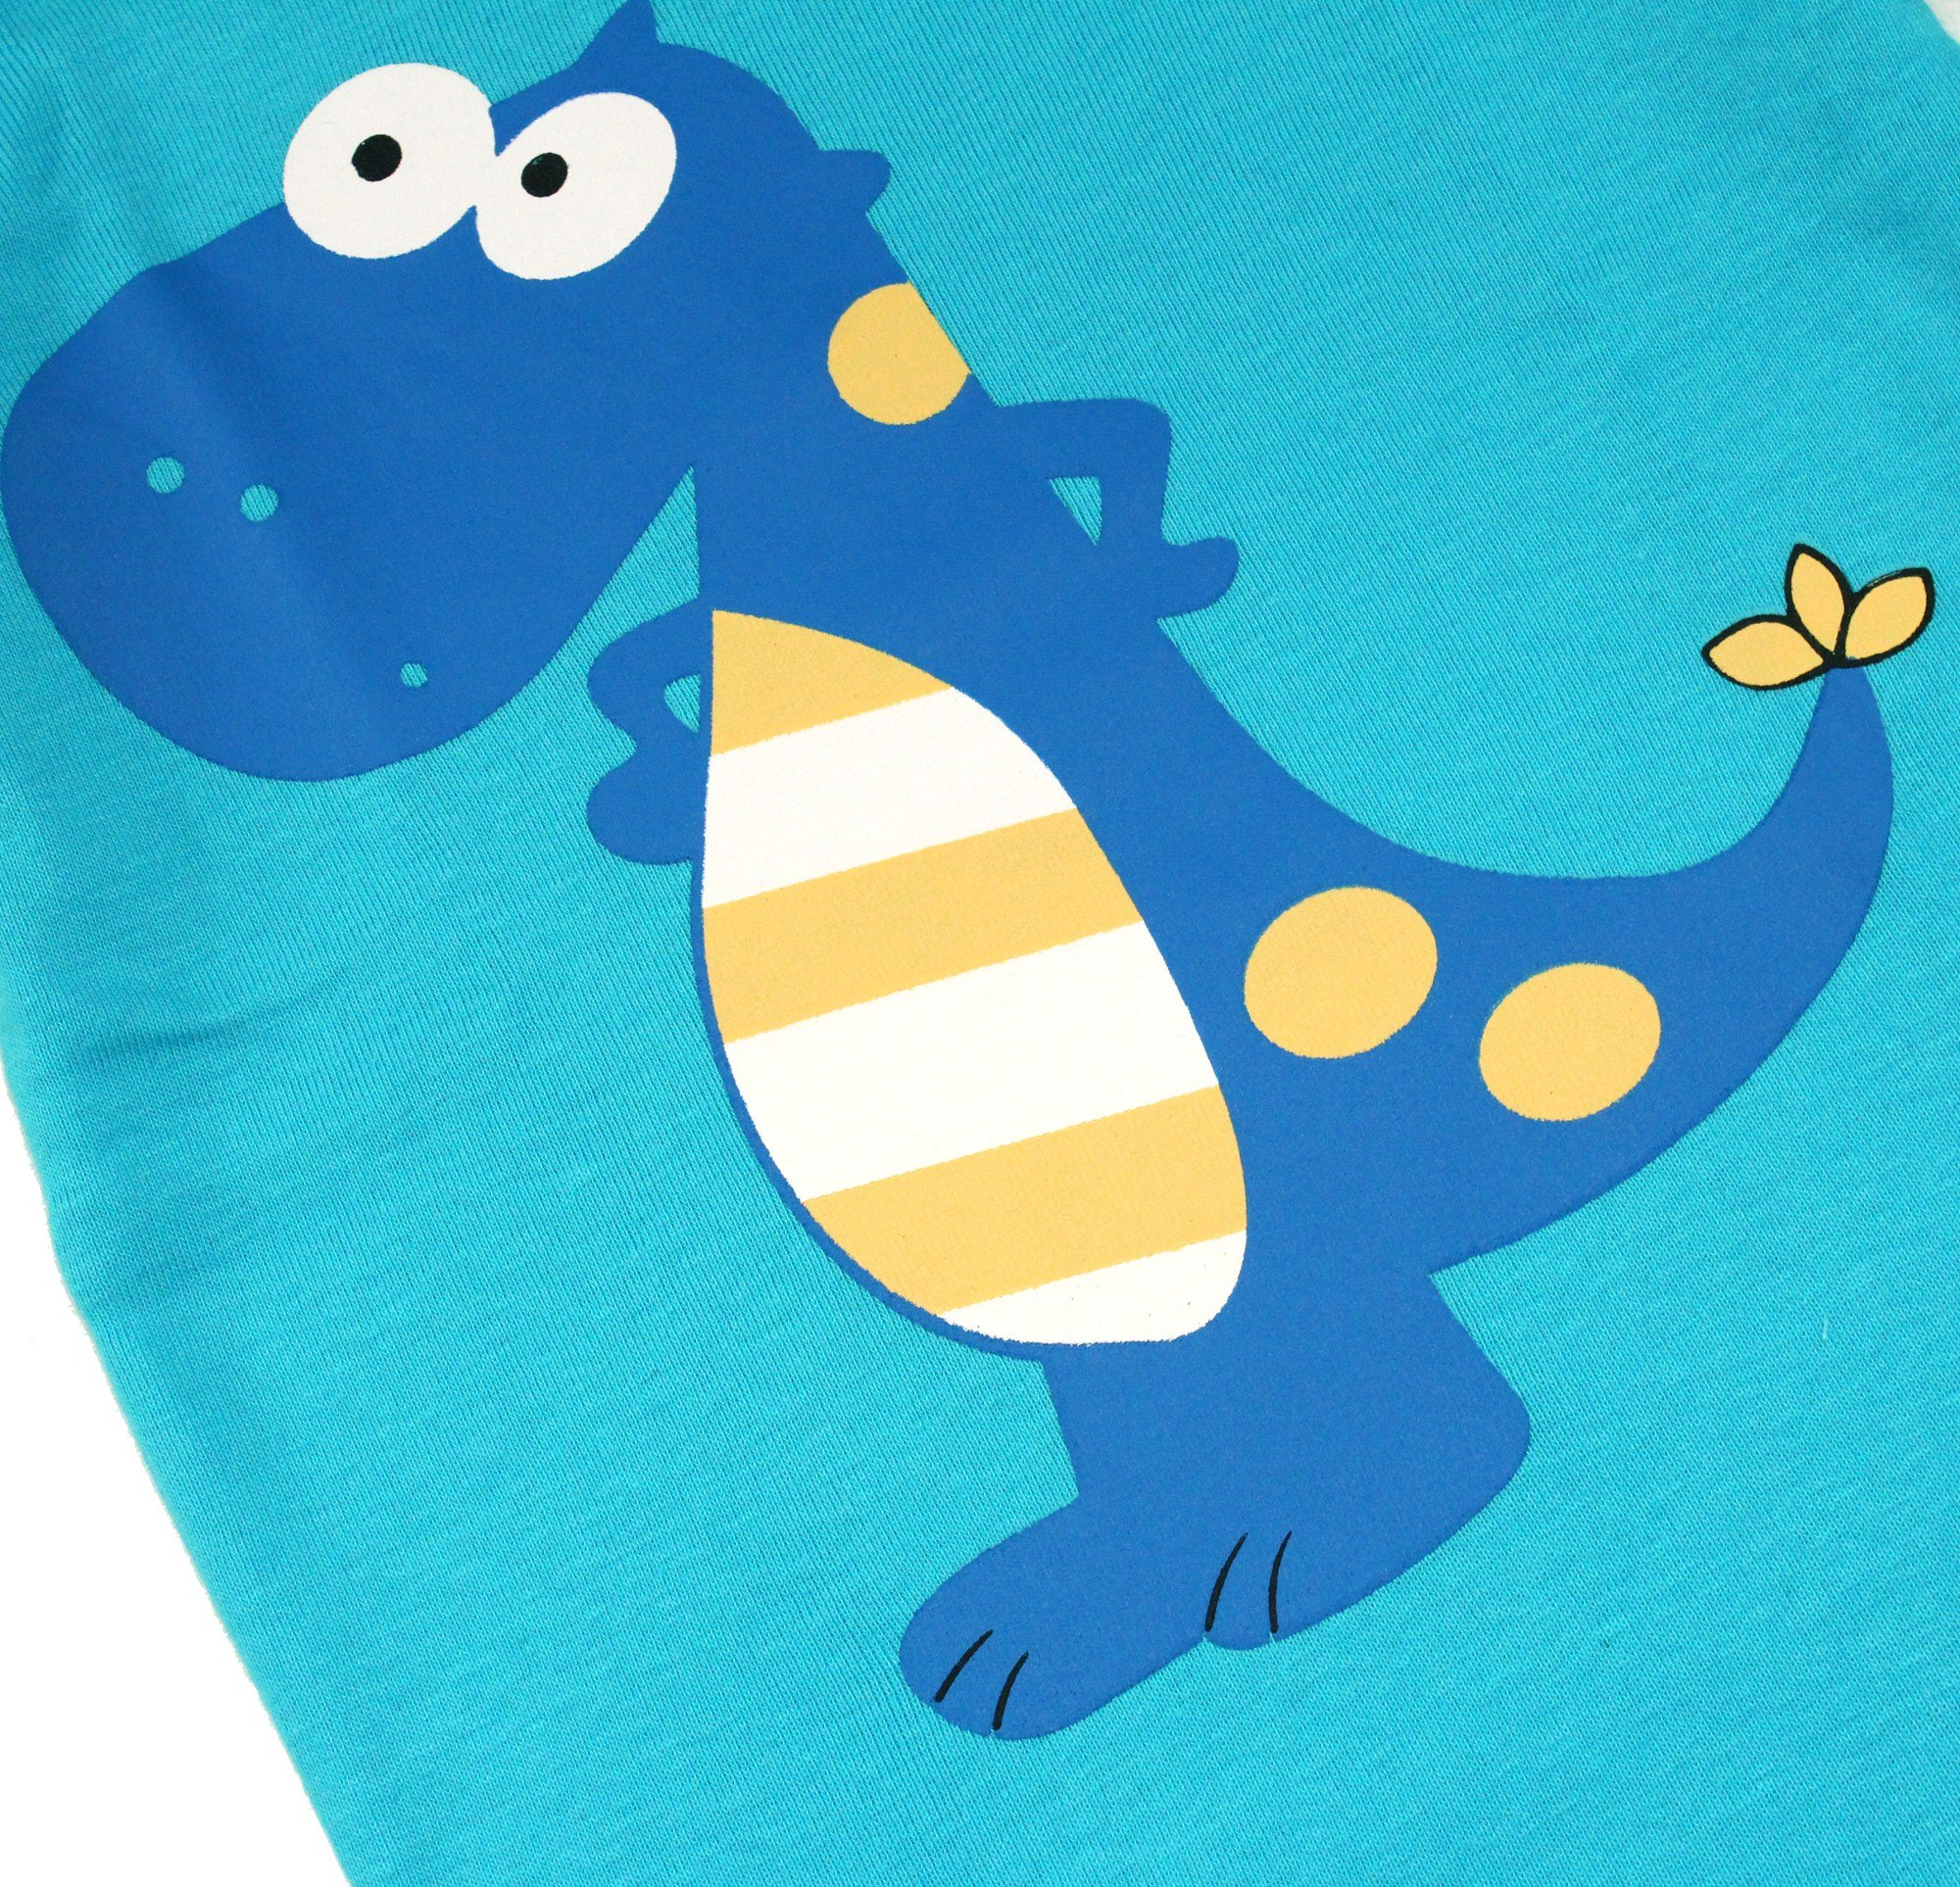 Boys Pajamas Boys Dinosaur Little Kid Shorts Set 100% Cotton Clothes Short Sleeves Sleepwear 8Y by shelry (Image #5)